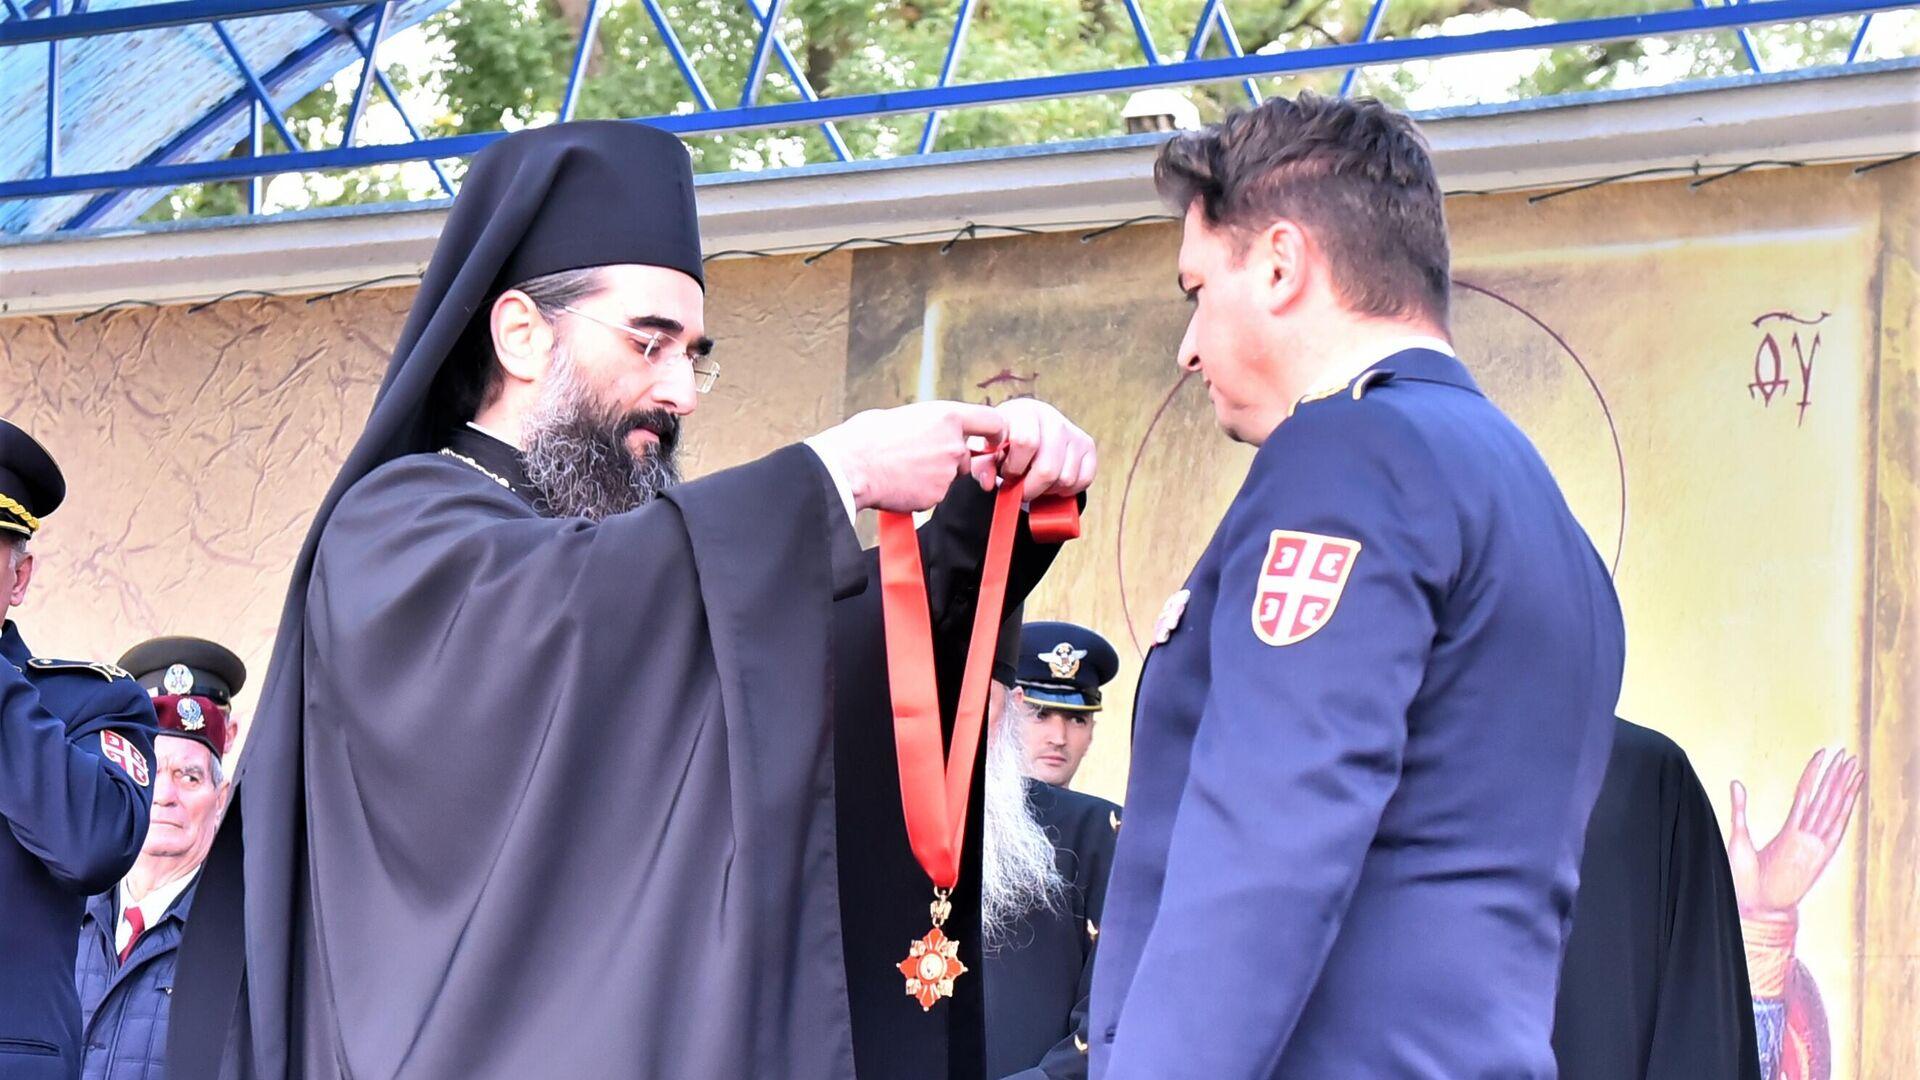 Vladika niški Arsenije uručuje orden Svetog Save komandantu 63.padobranske brigadnom generalu Nenadu Zoniću - Sputnik Srbija, 1920, 14.10.2021